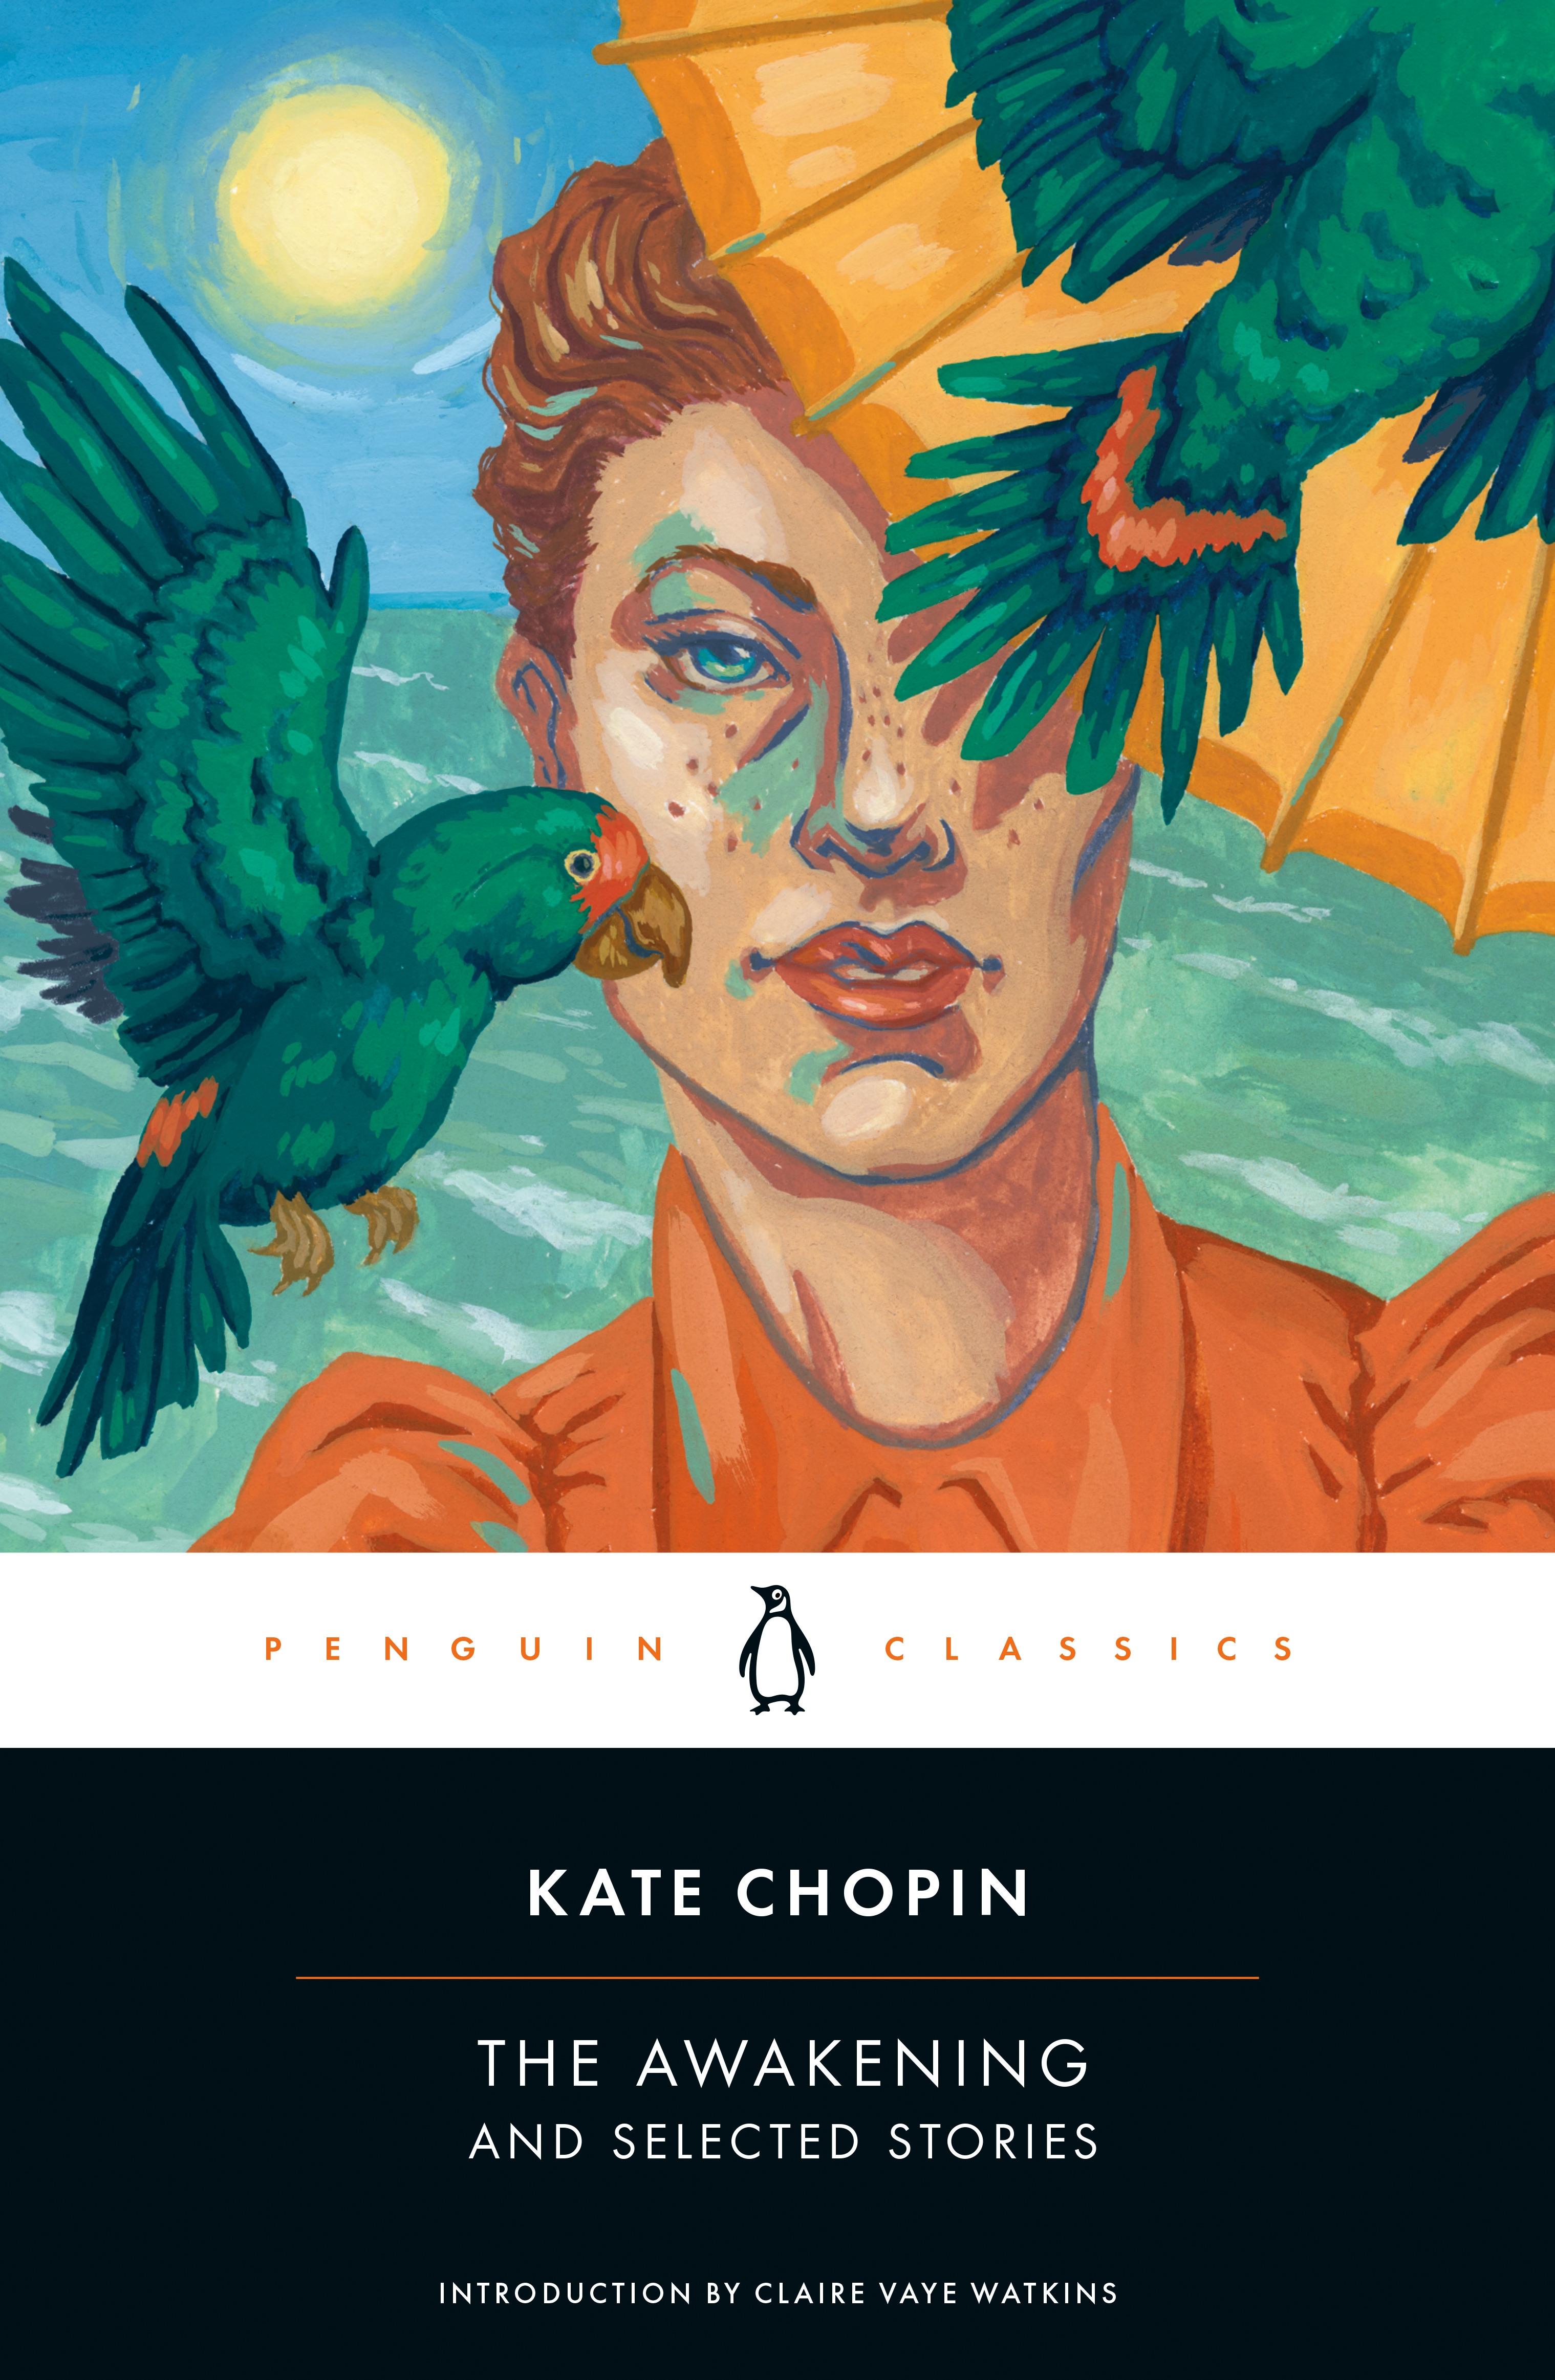 individualism in kate chopins the awakening essay